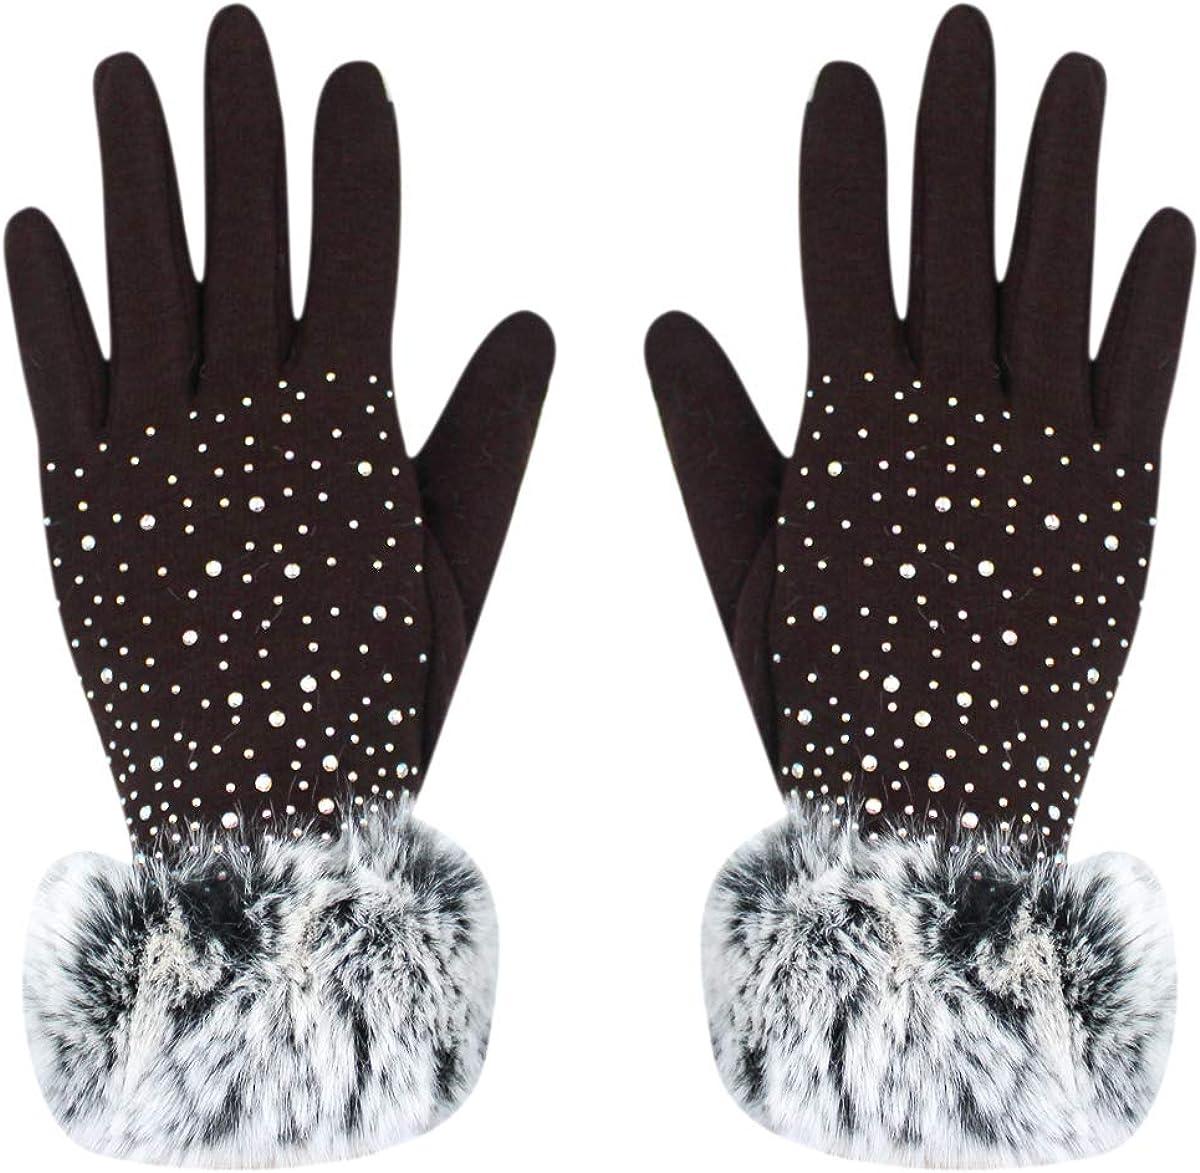 Women Luxurious Rhinestones Winter Gloves Touchscreen Fleece Lined Mittens with Rabbit Fur Cuffs